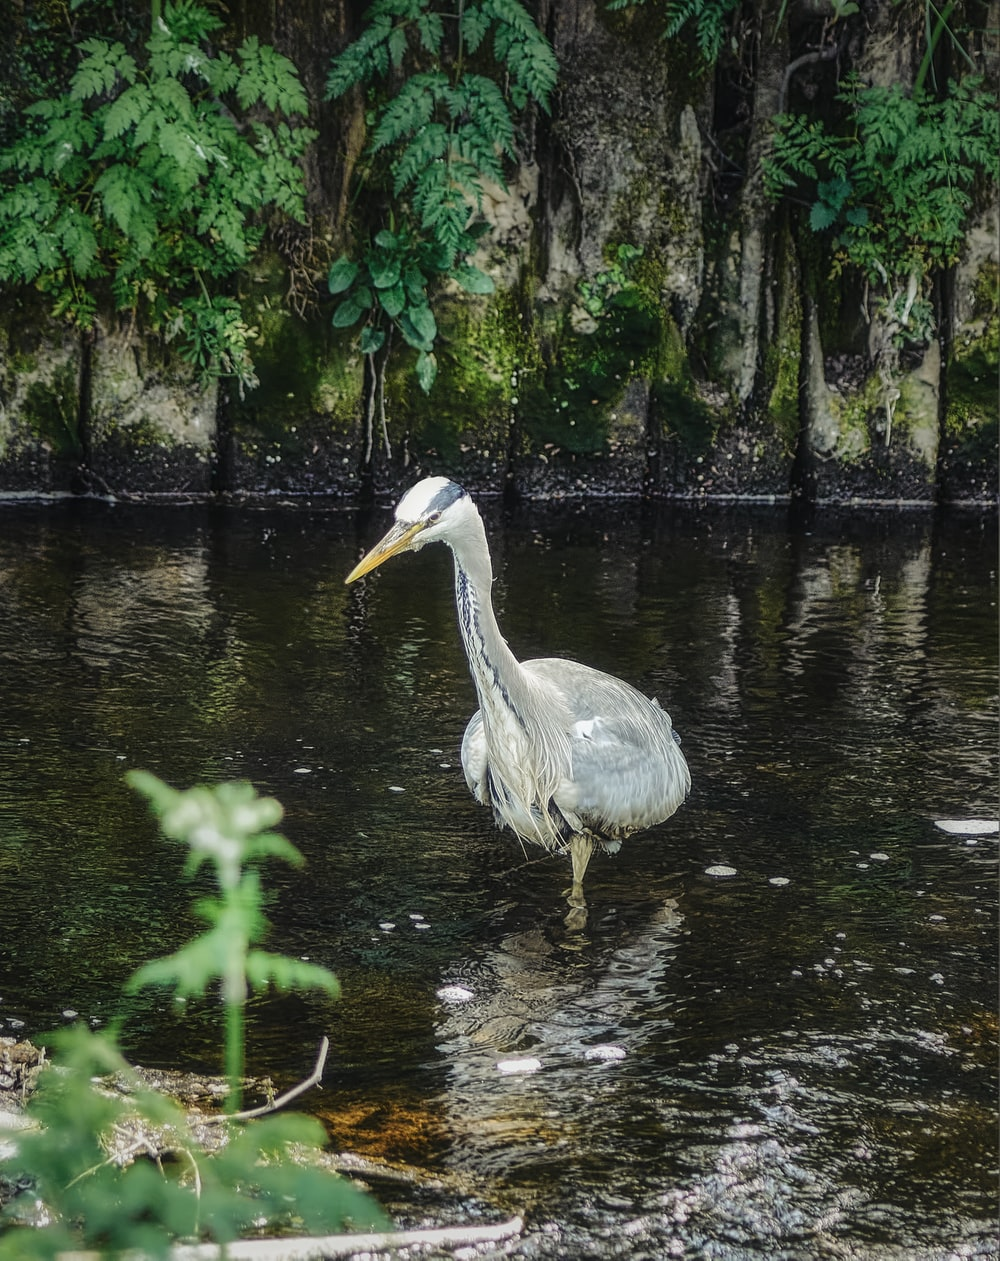 white bird on water near green plants during daytime